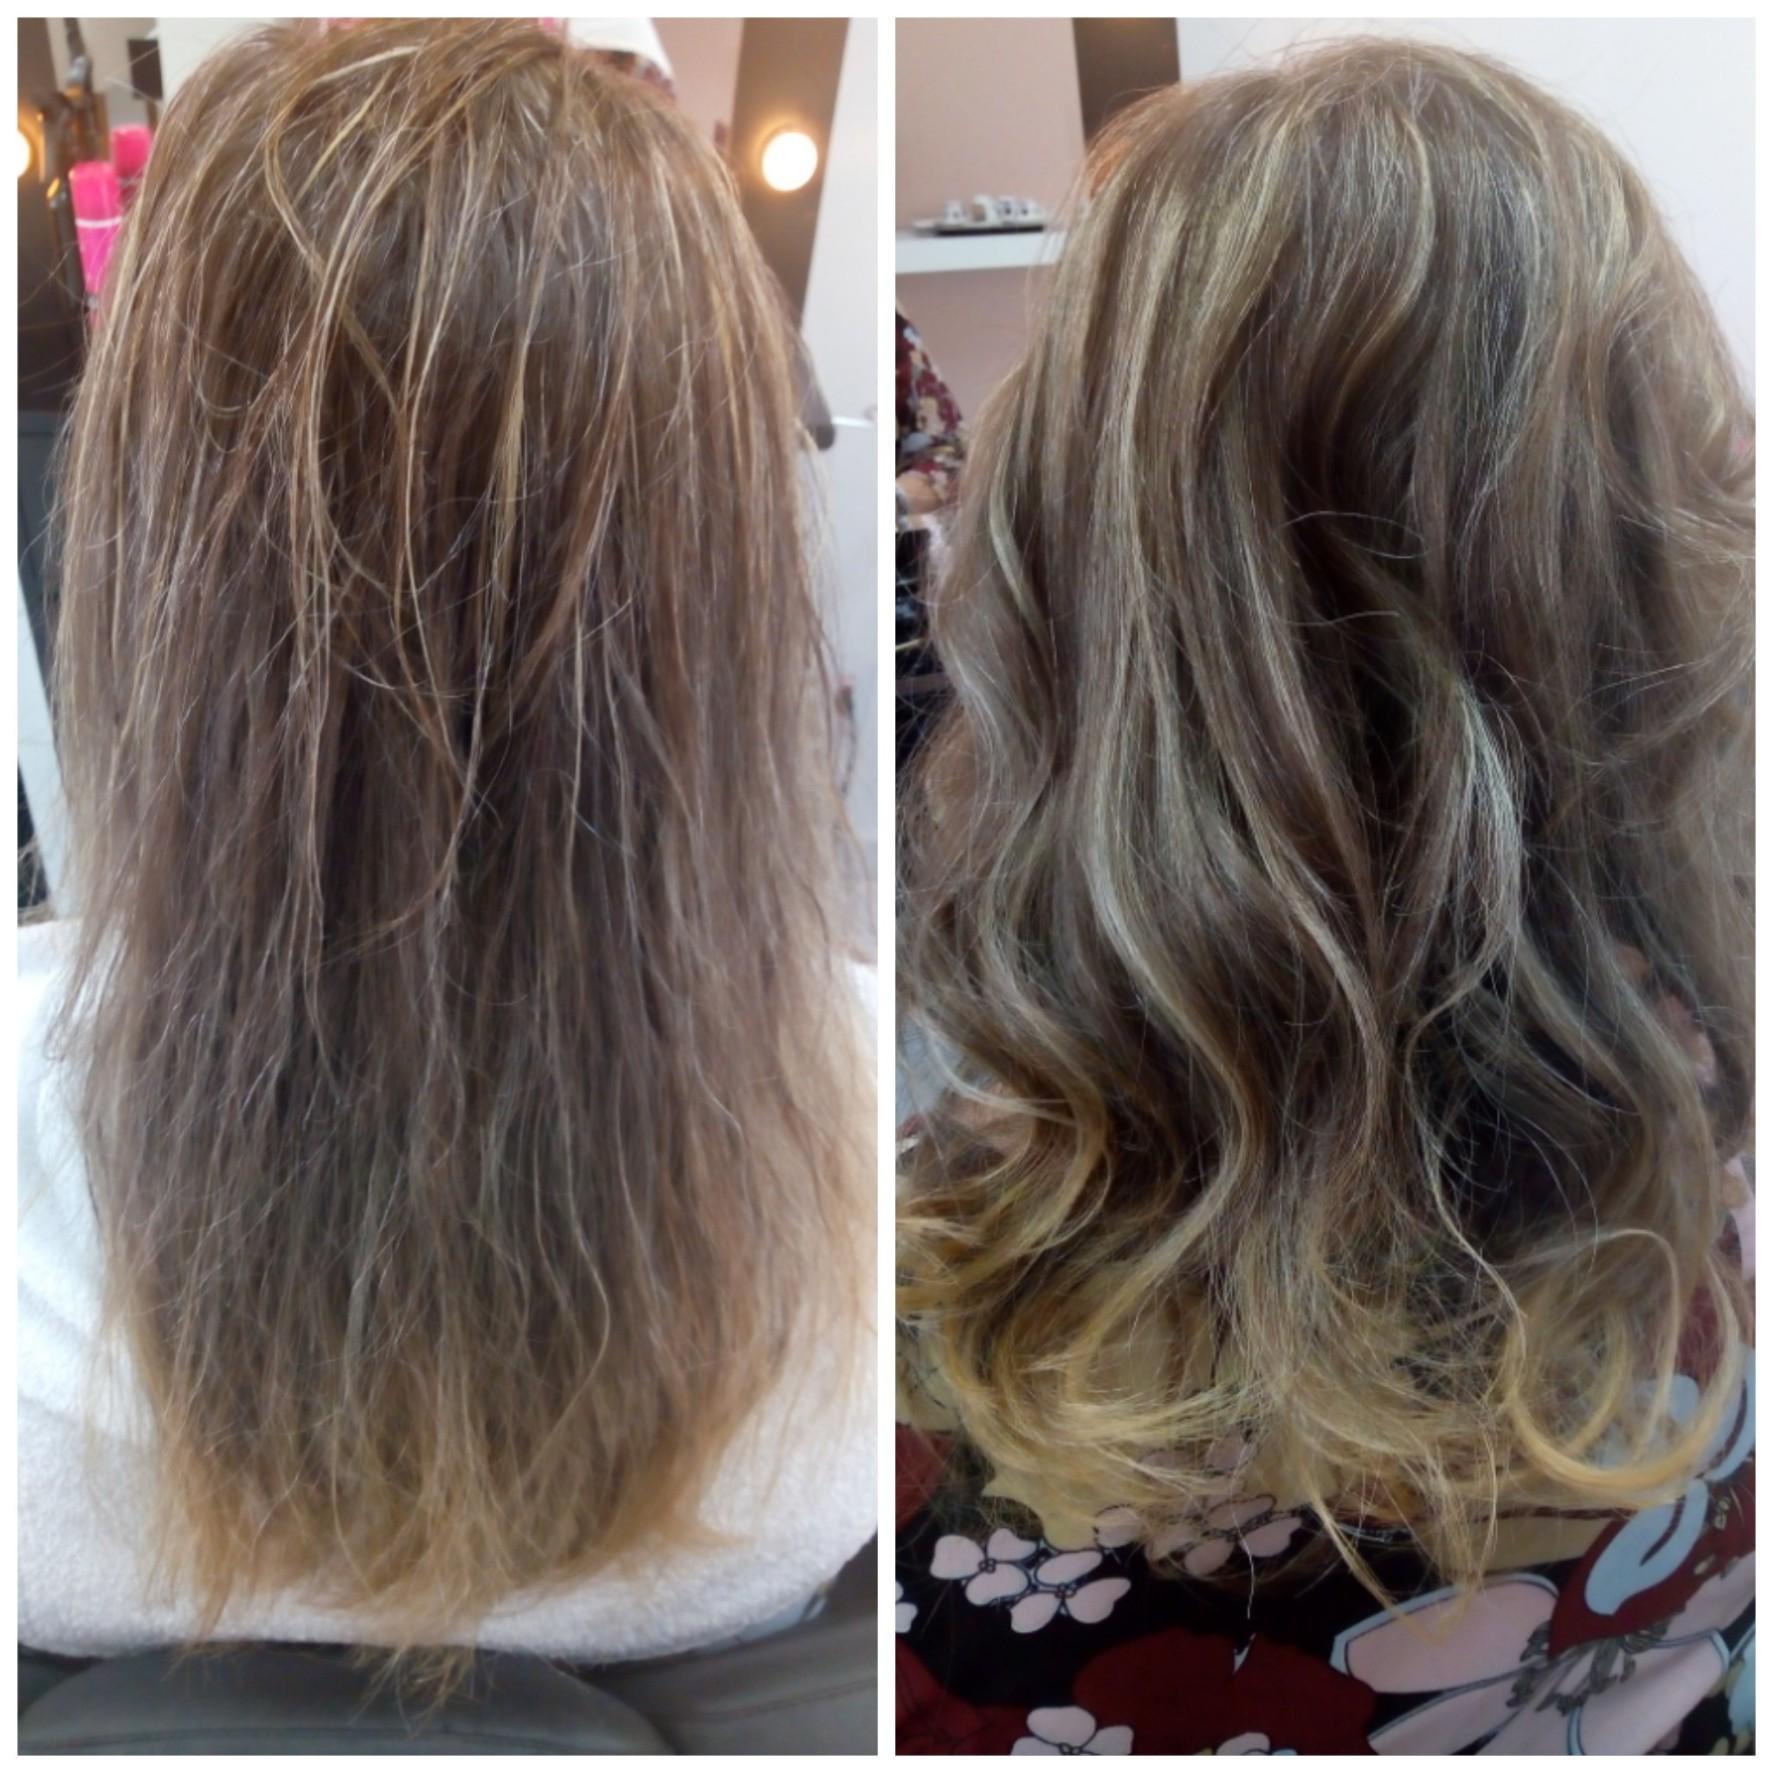 Escova preparo . Paulo Persil  Efeito onda  cabelo auxiliar cabeleireiro(a) vendedor(a)